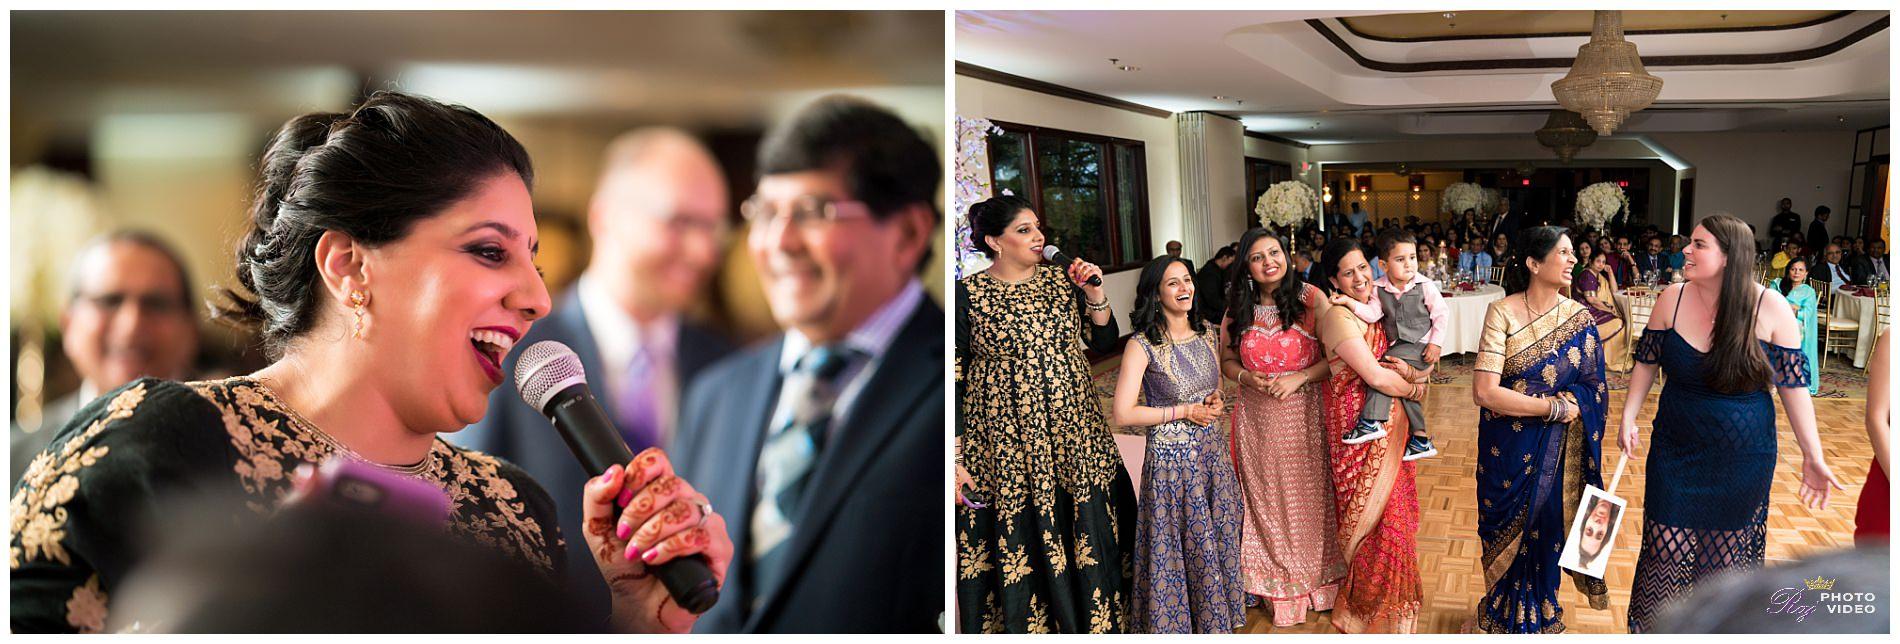 Martinsville-Gardens-NJ-Indian-Wedding-Ruchi-Vishal-63.jpg